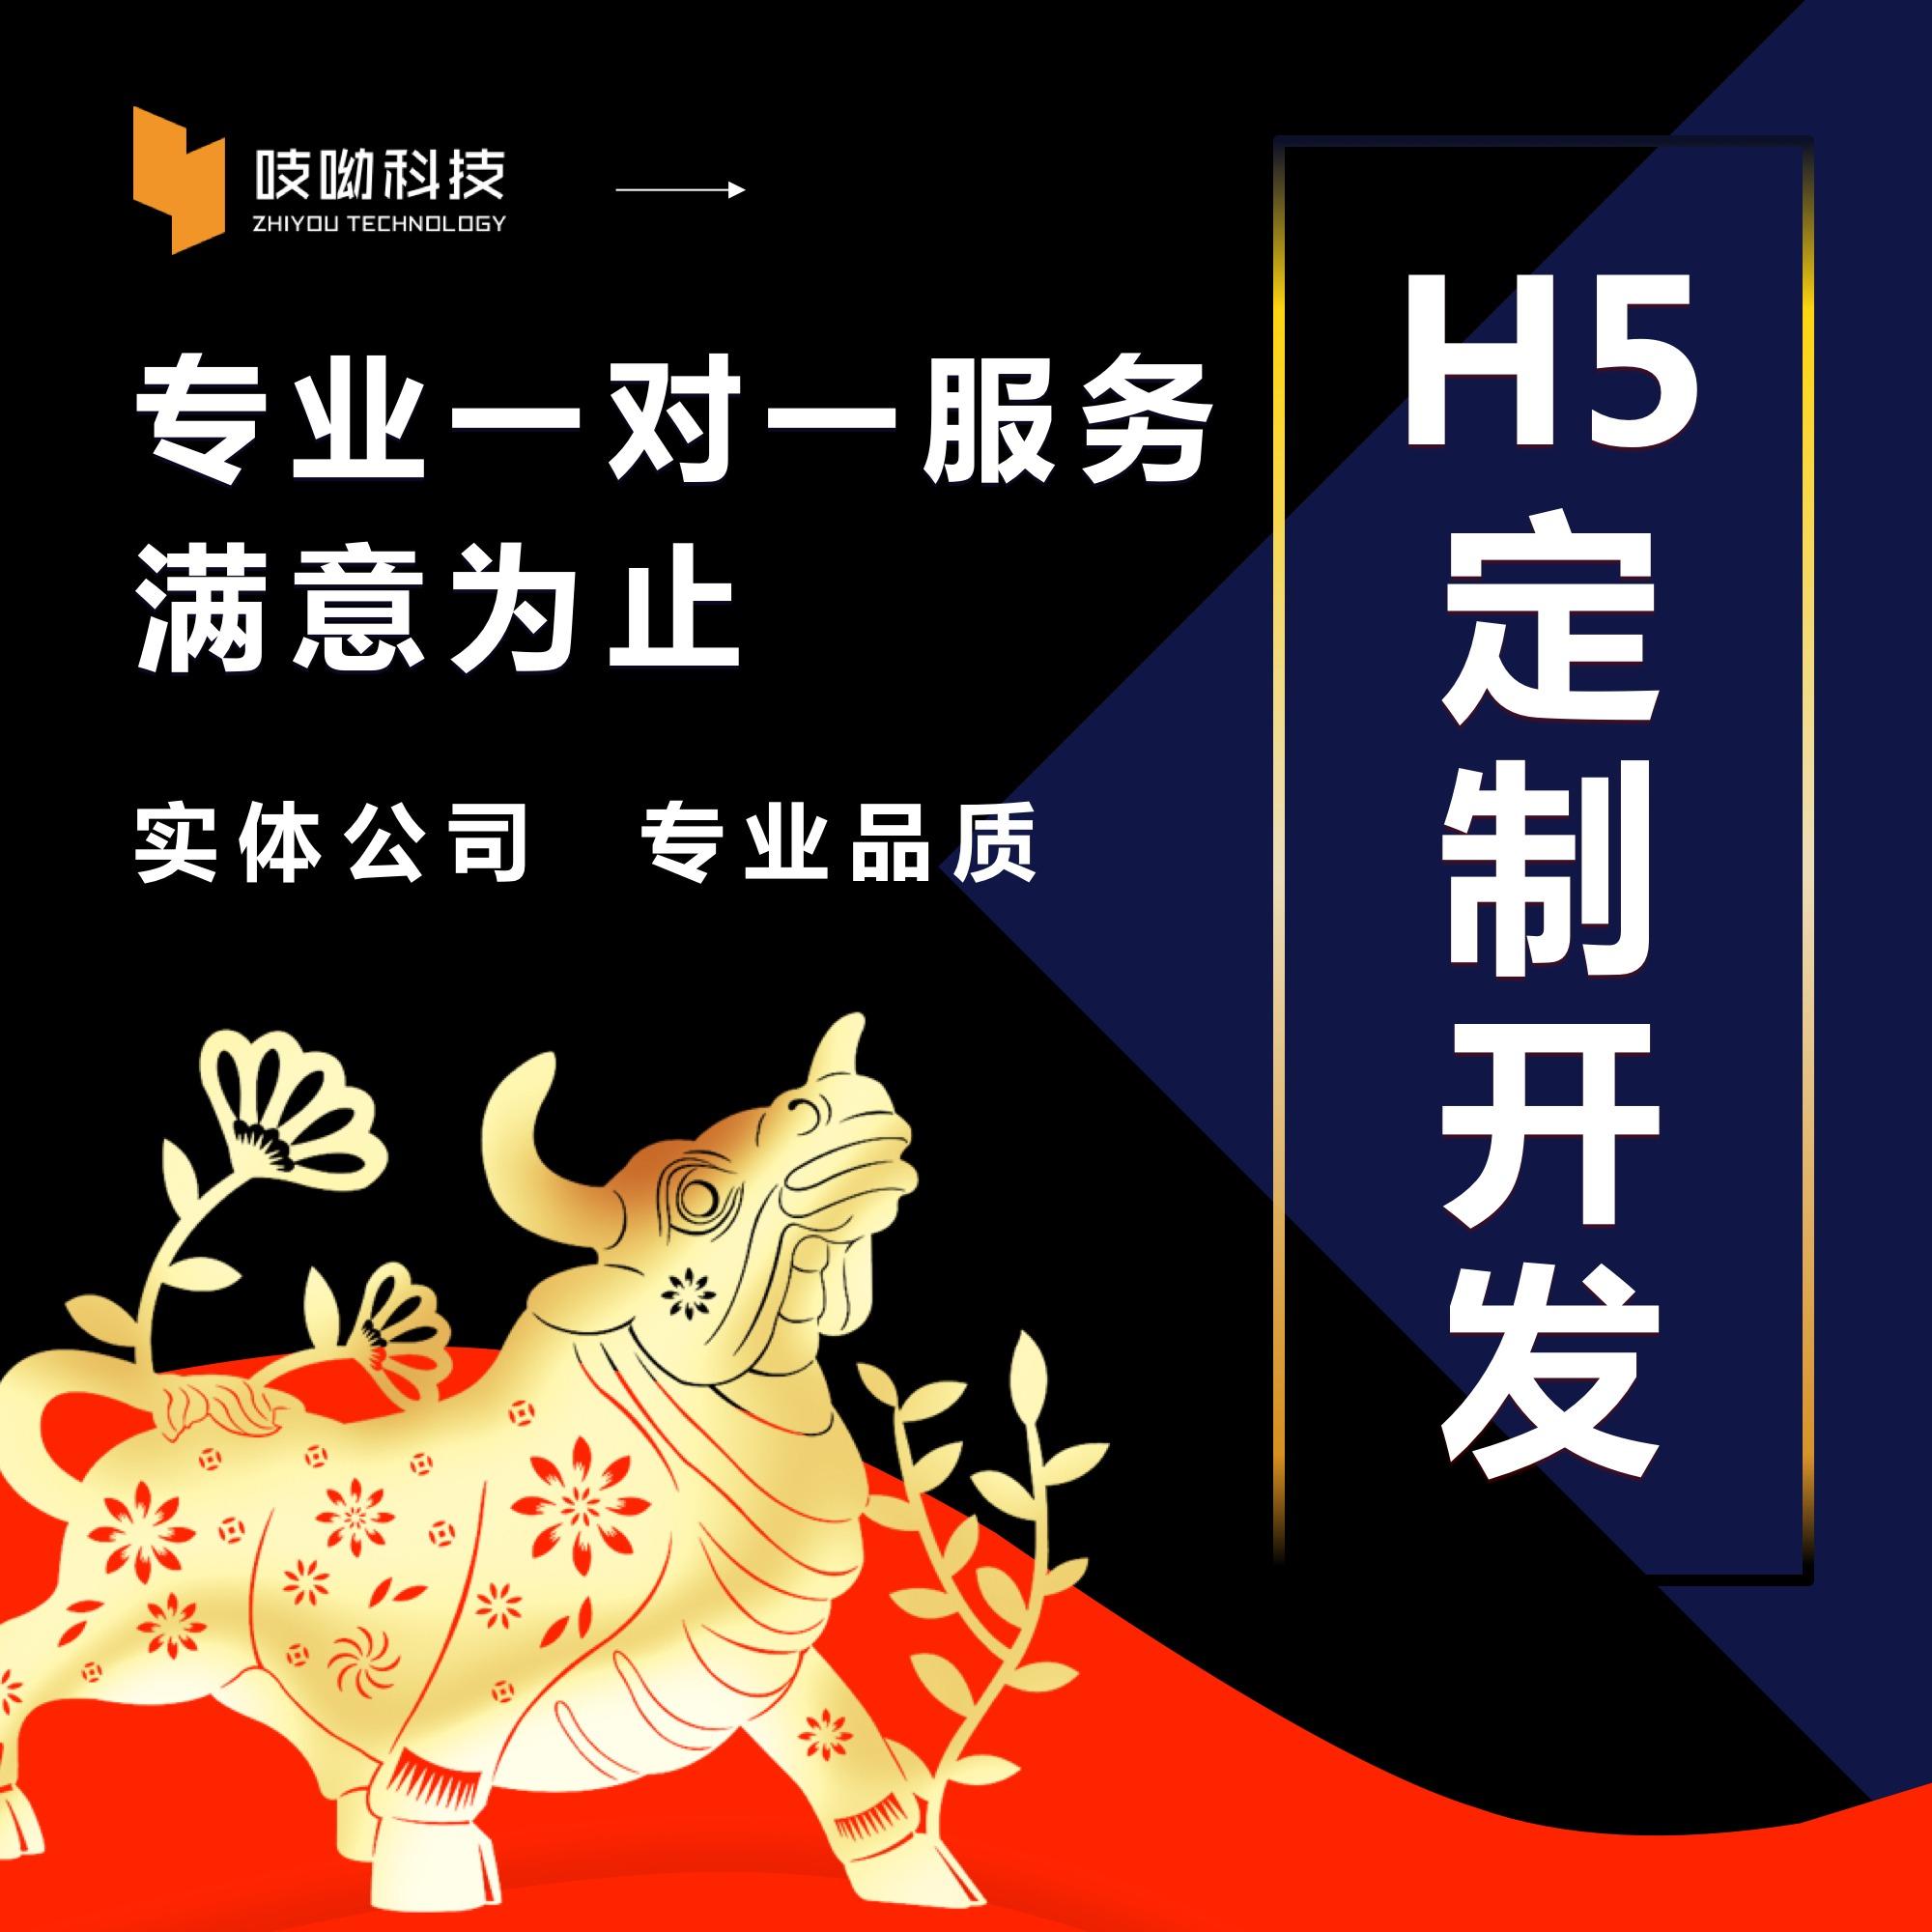 H5微信互动春节红包有声贺卡摇签生成海报人脸融合集福跑酷游戏